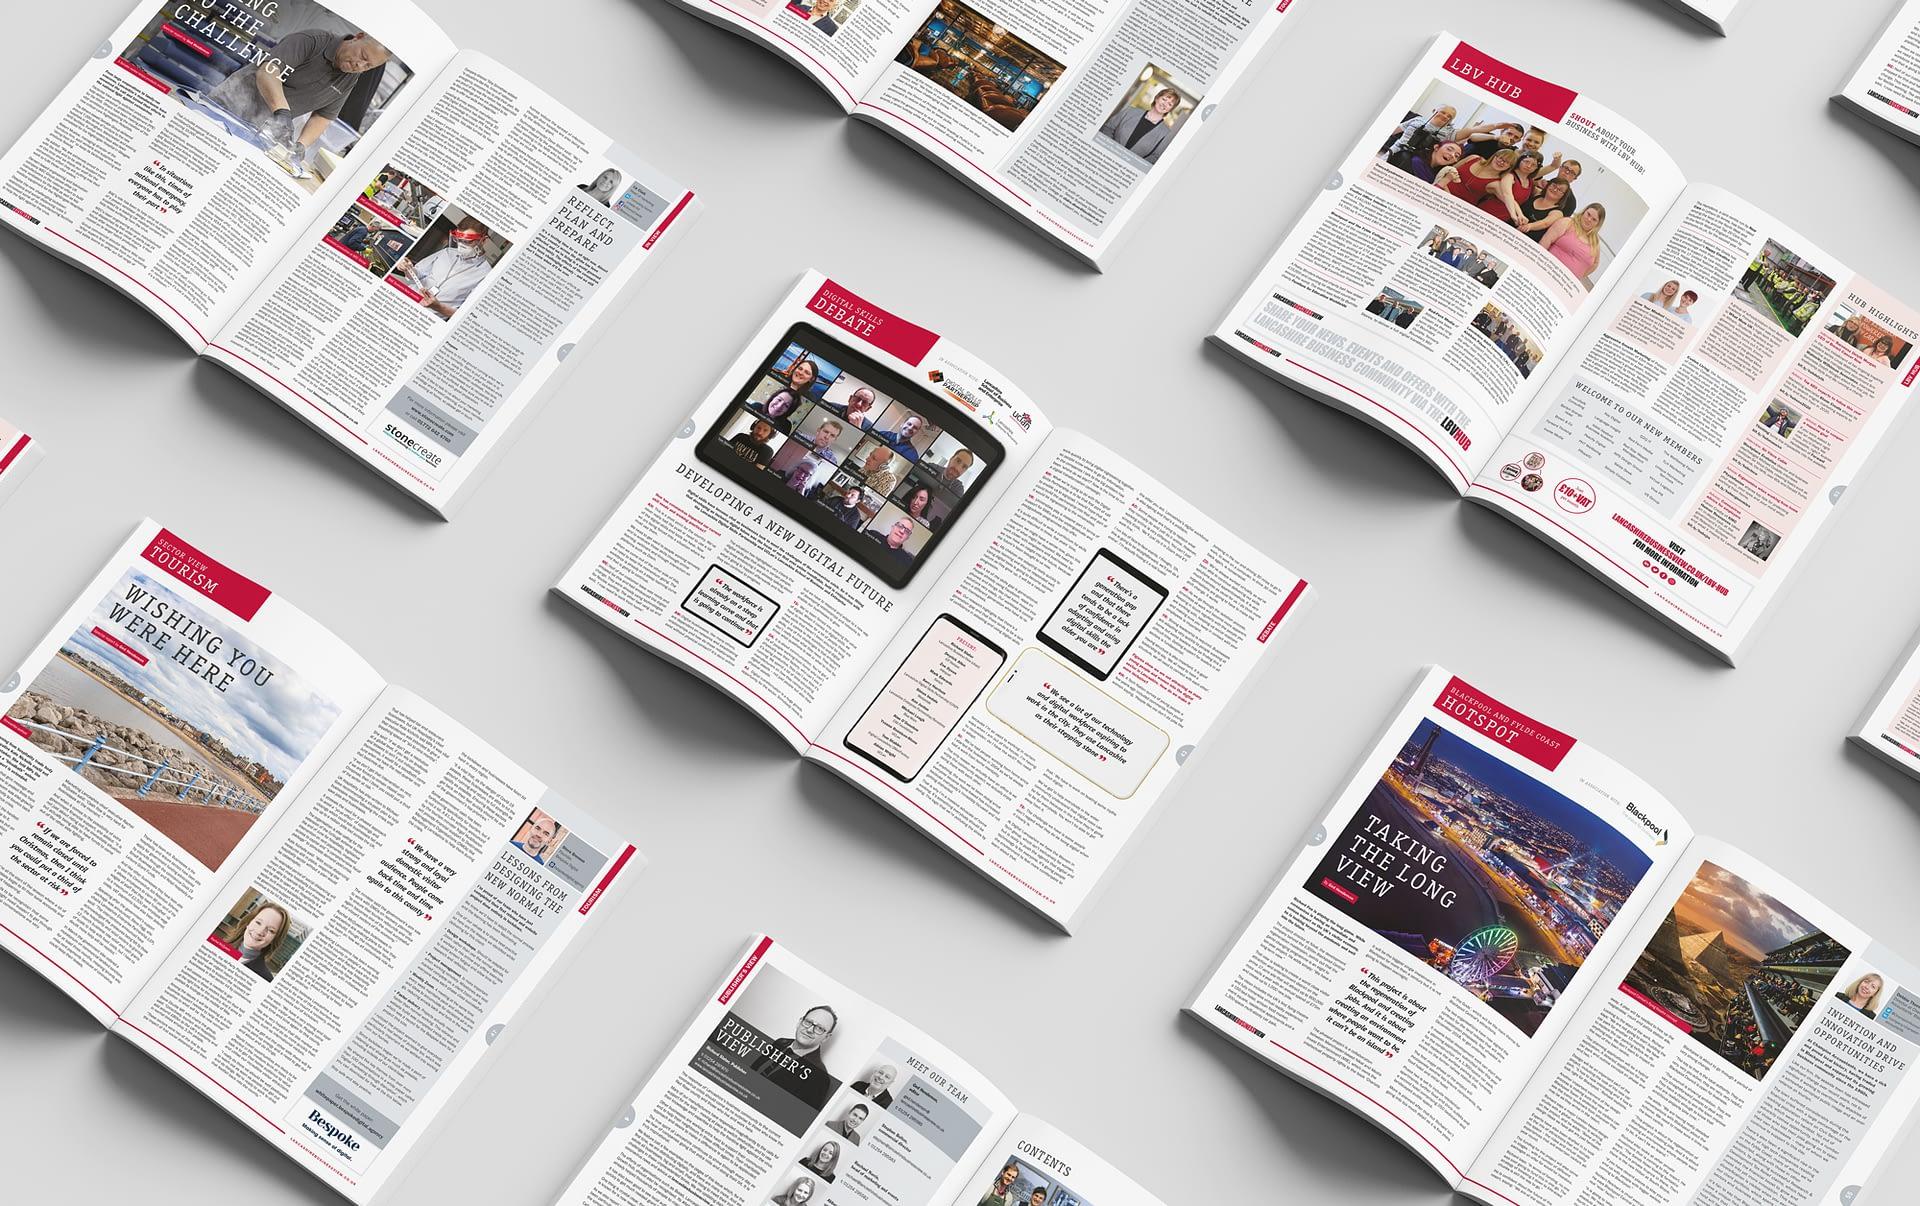 Lancashire Business View Magazine Spreads